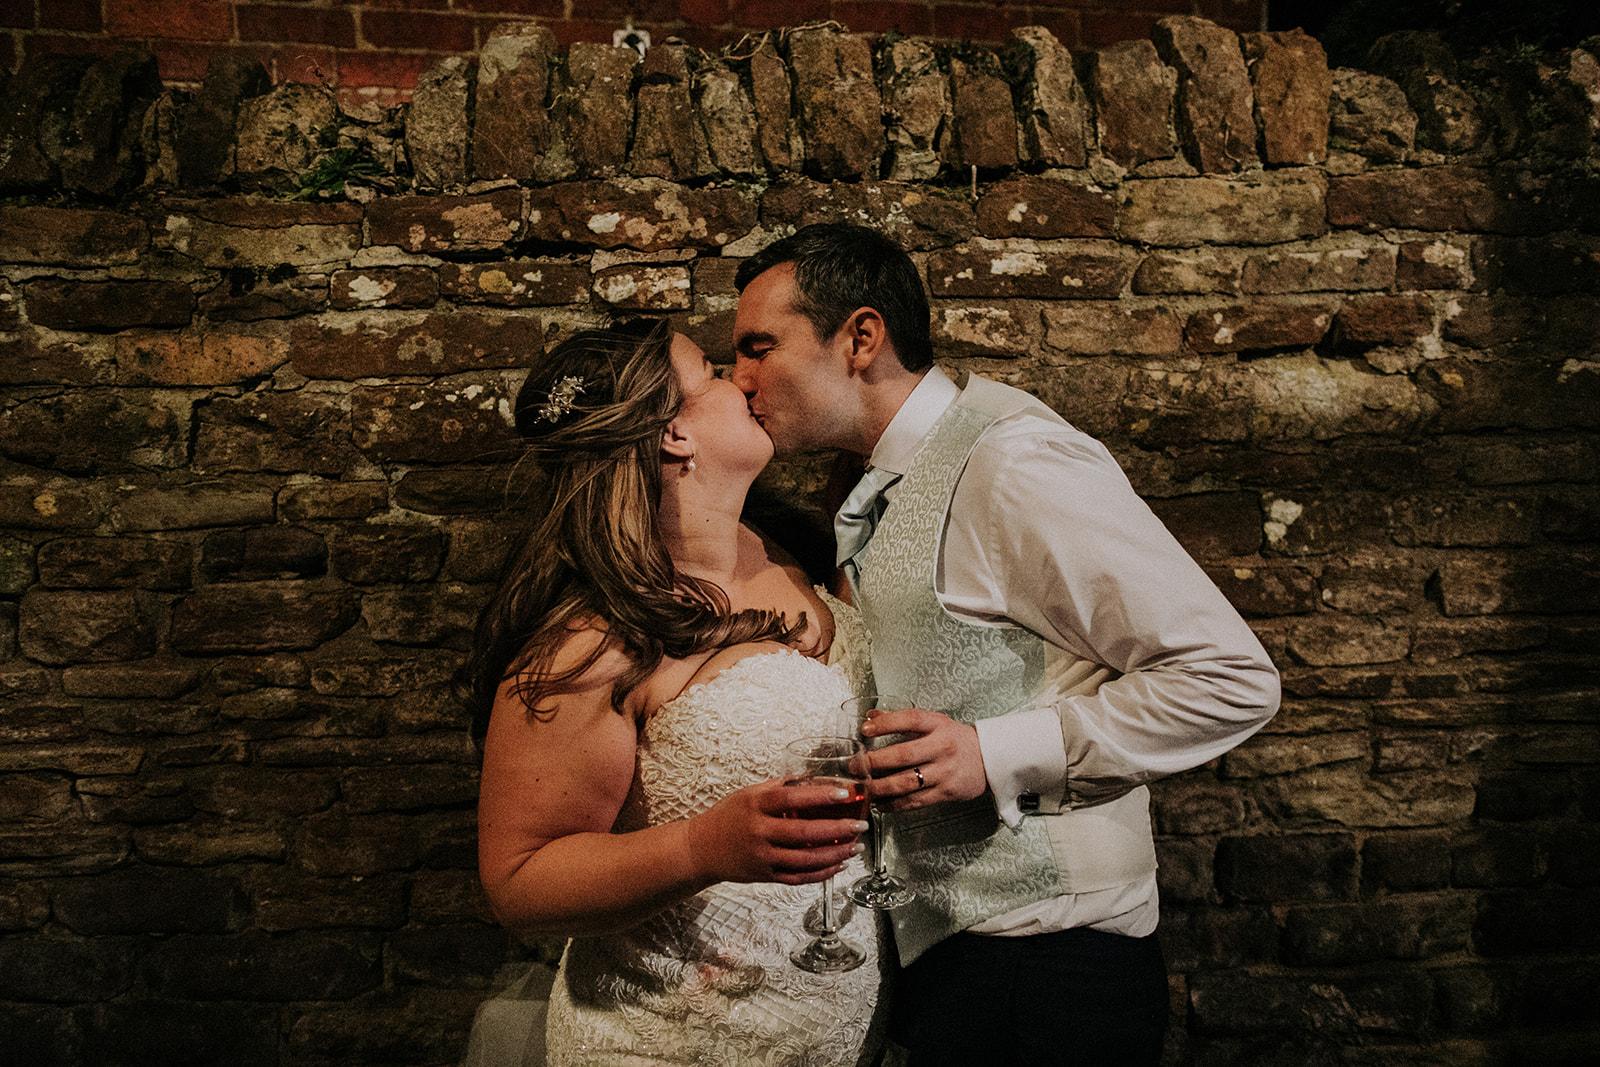 rutland wedding - fun wedding - east midlands wedding planner - Leicestershire wedding planning - nottingham wedding planning - bride and groom kiss